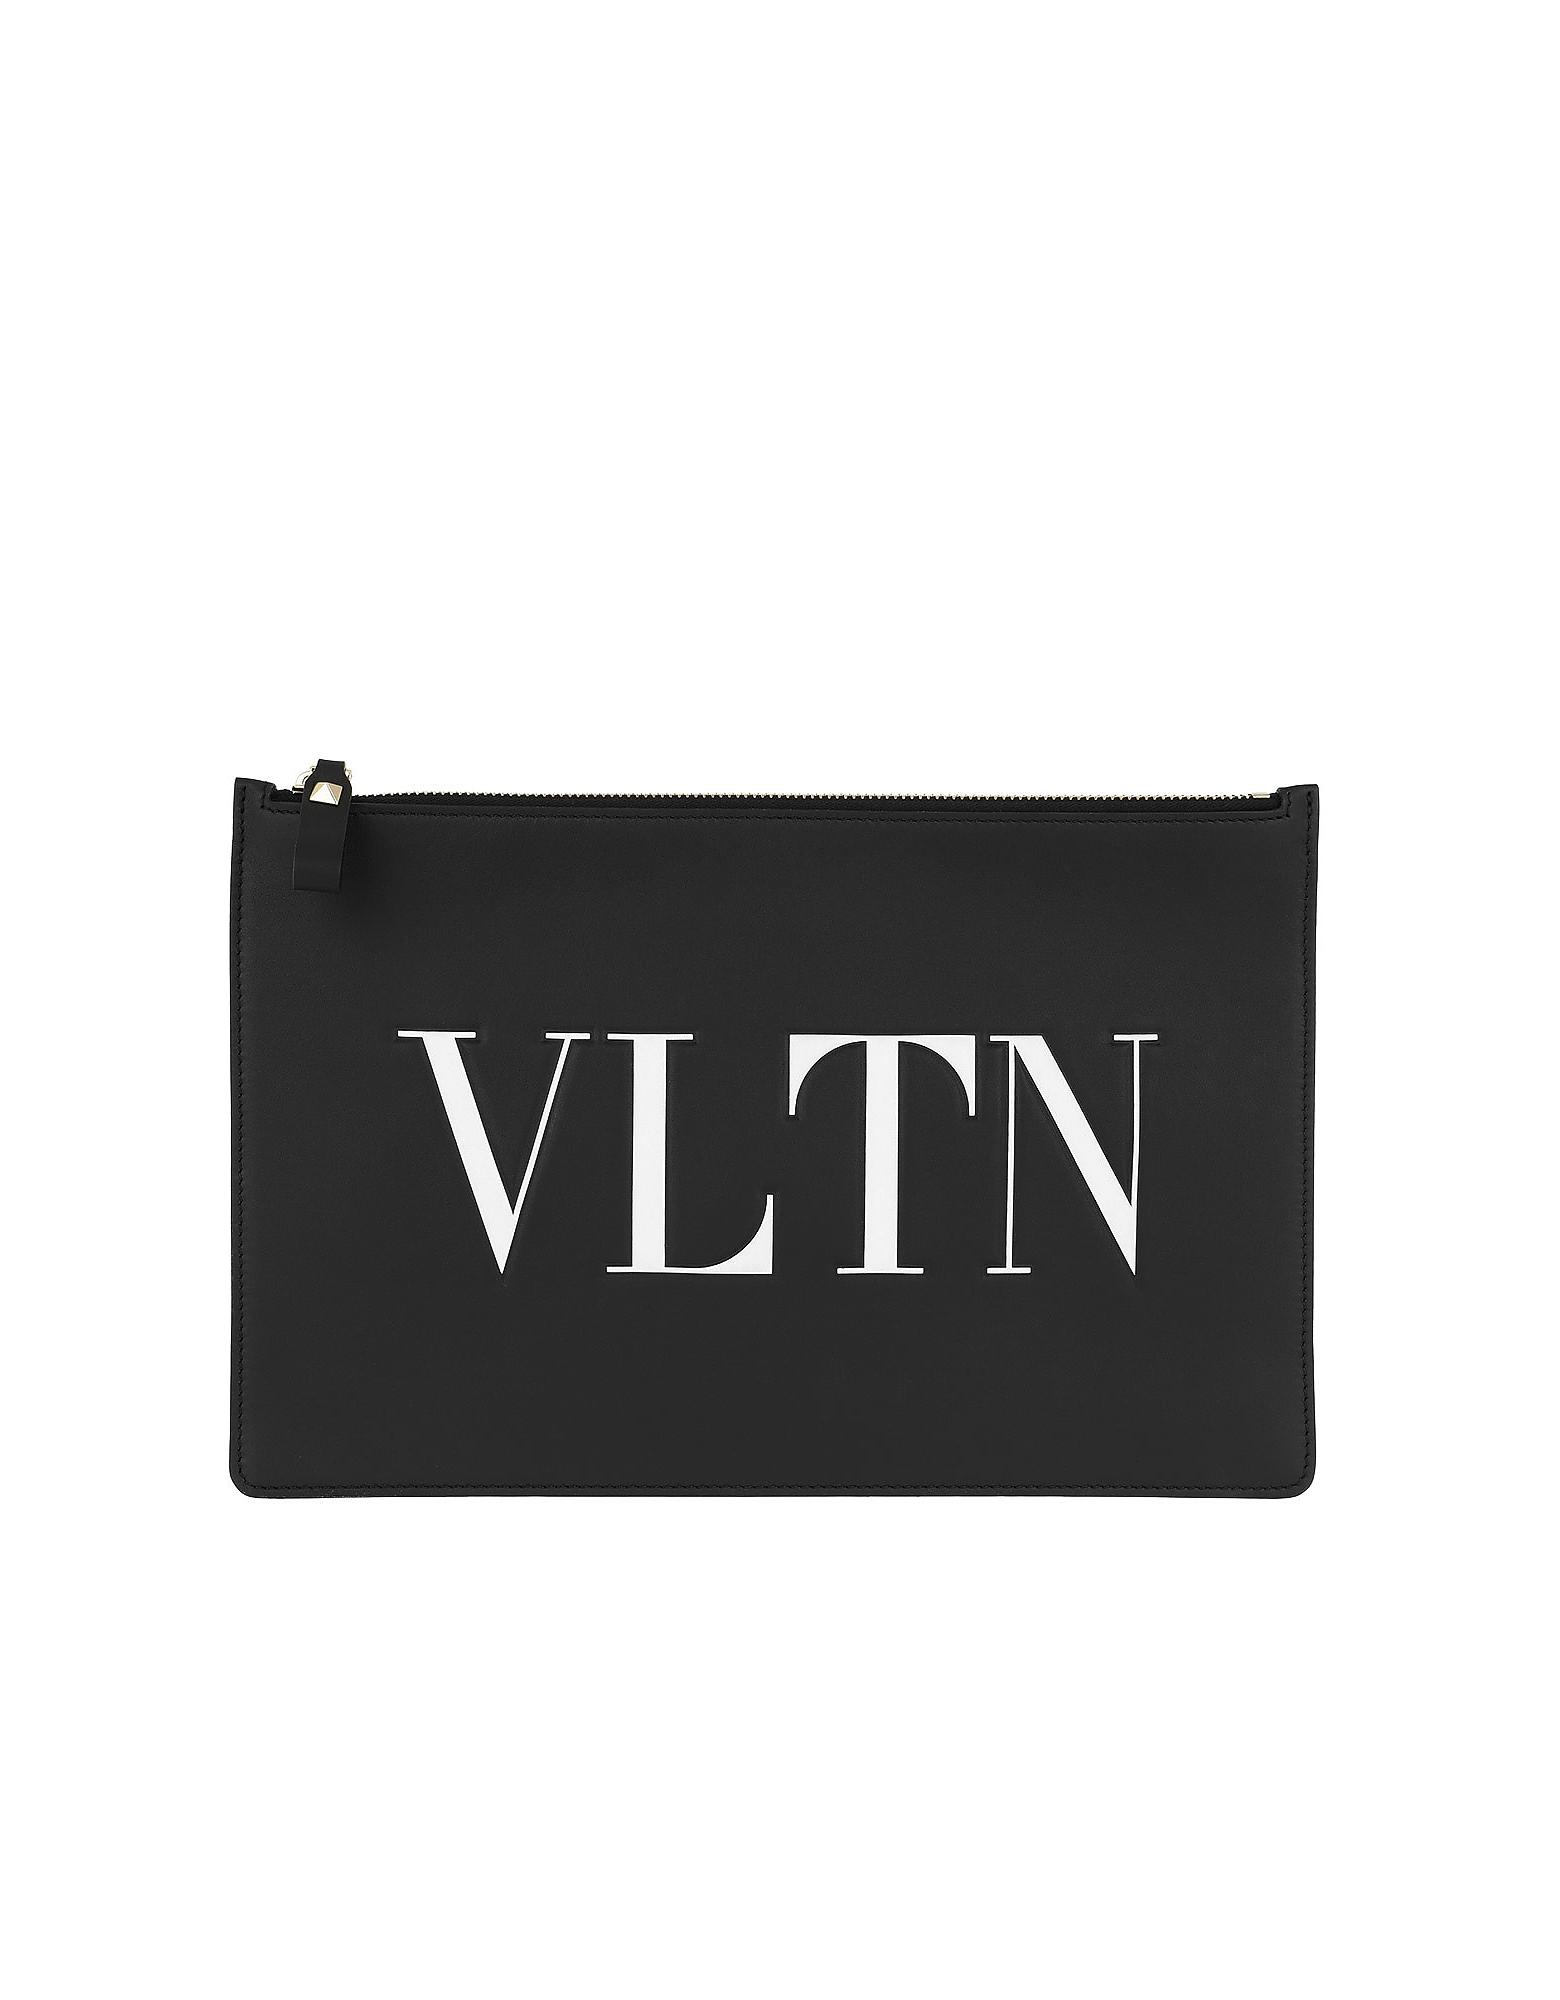 VLTN Pouchette Leather Black/White